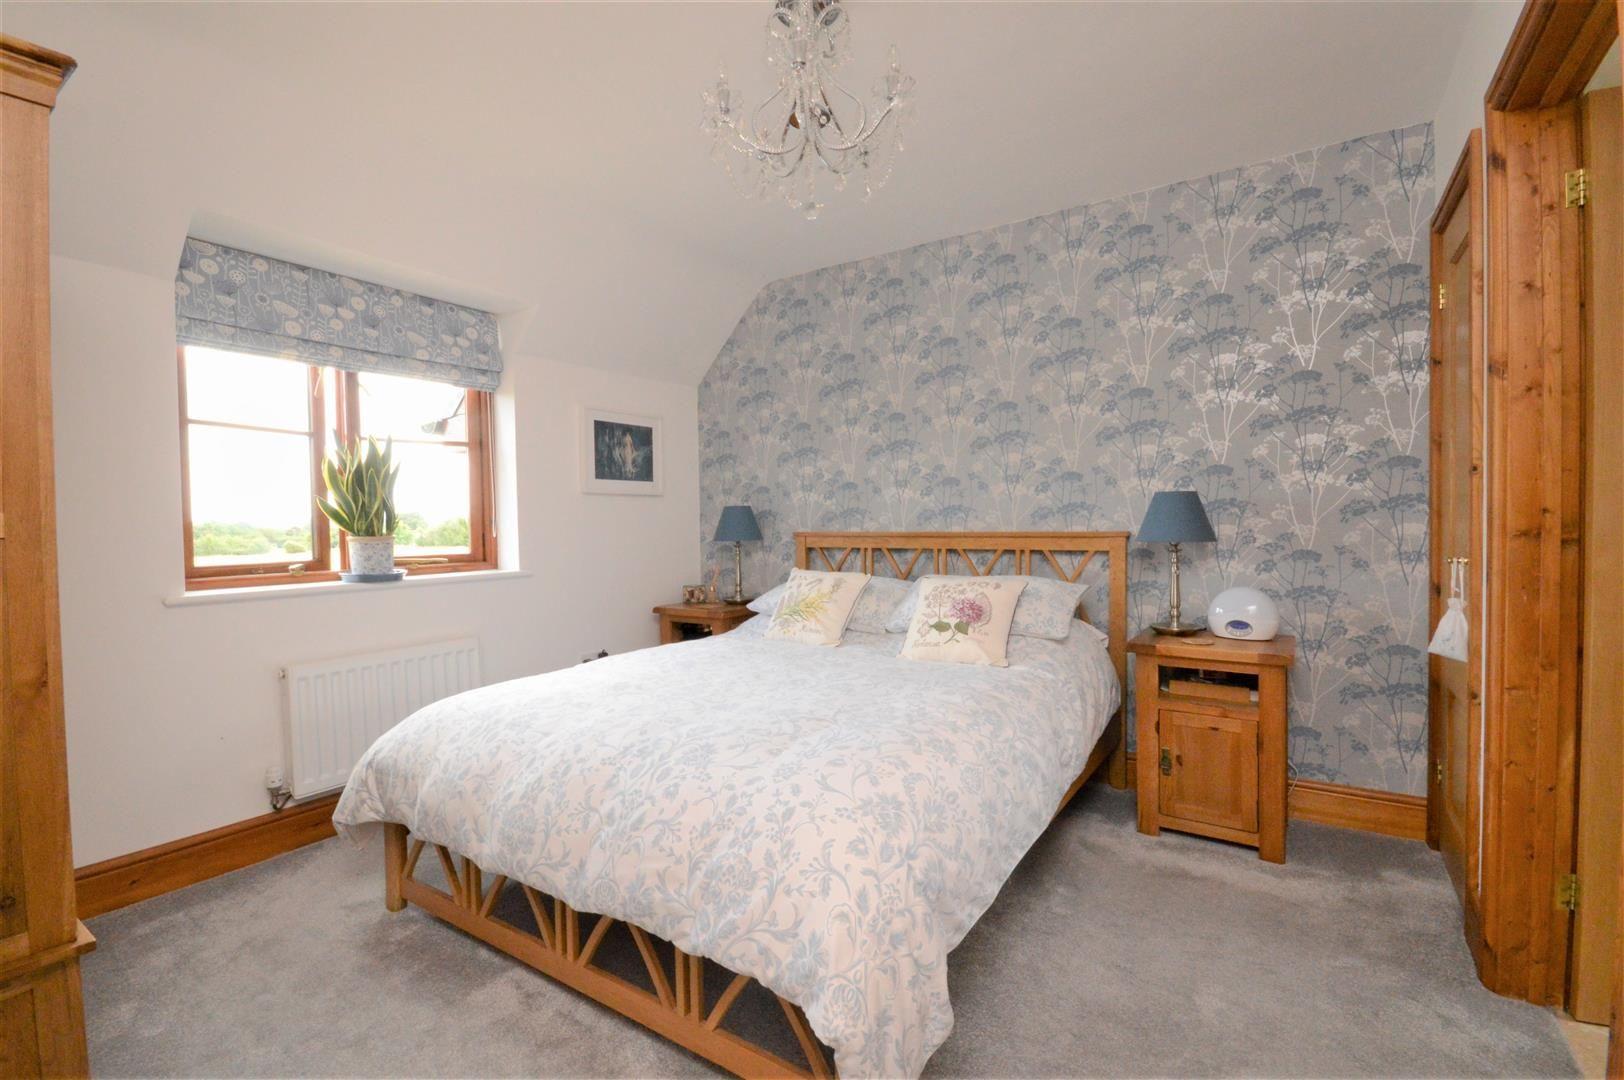 4 bed detached for sale in Eardisley 19